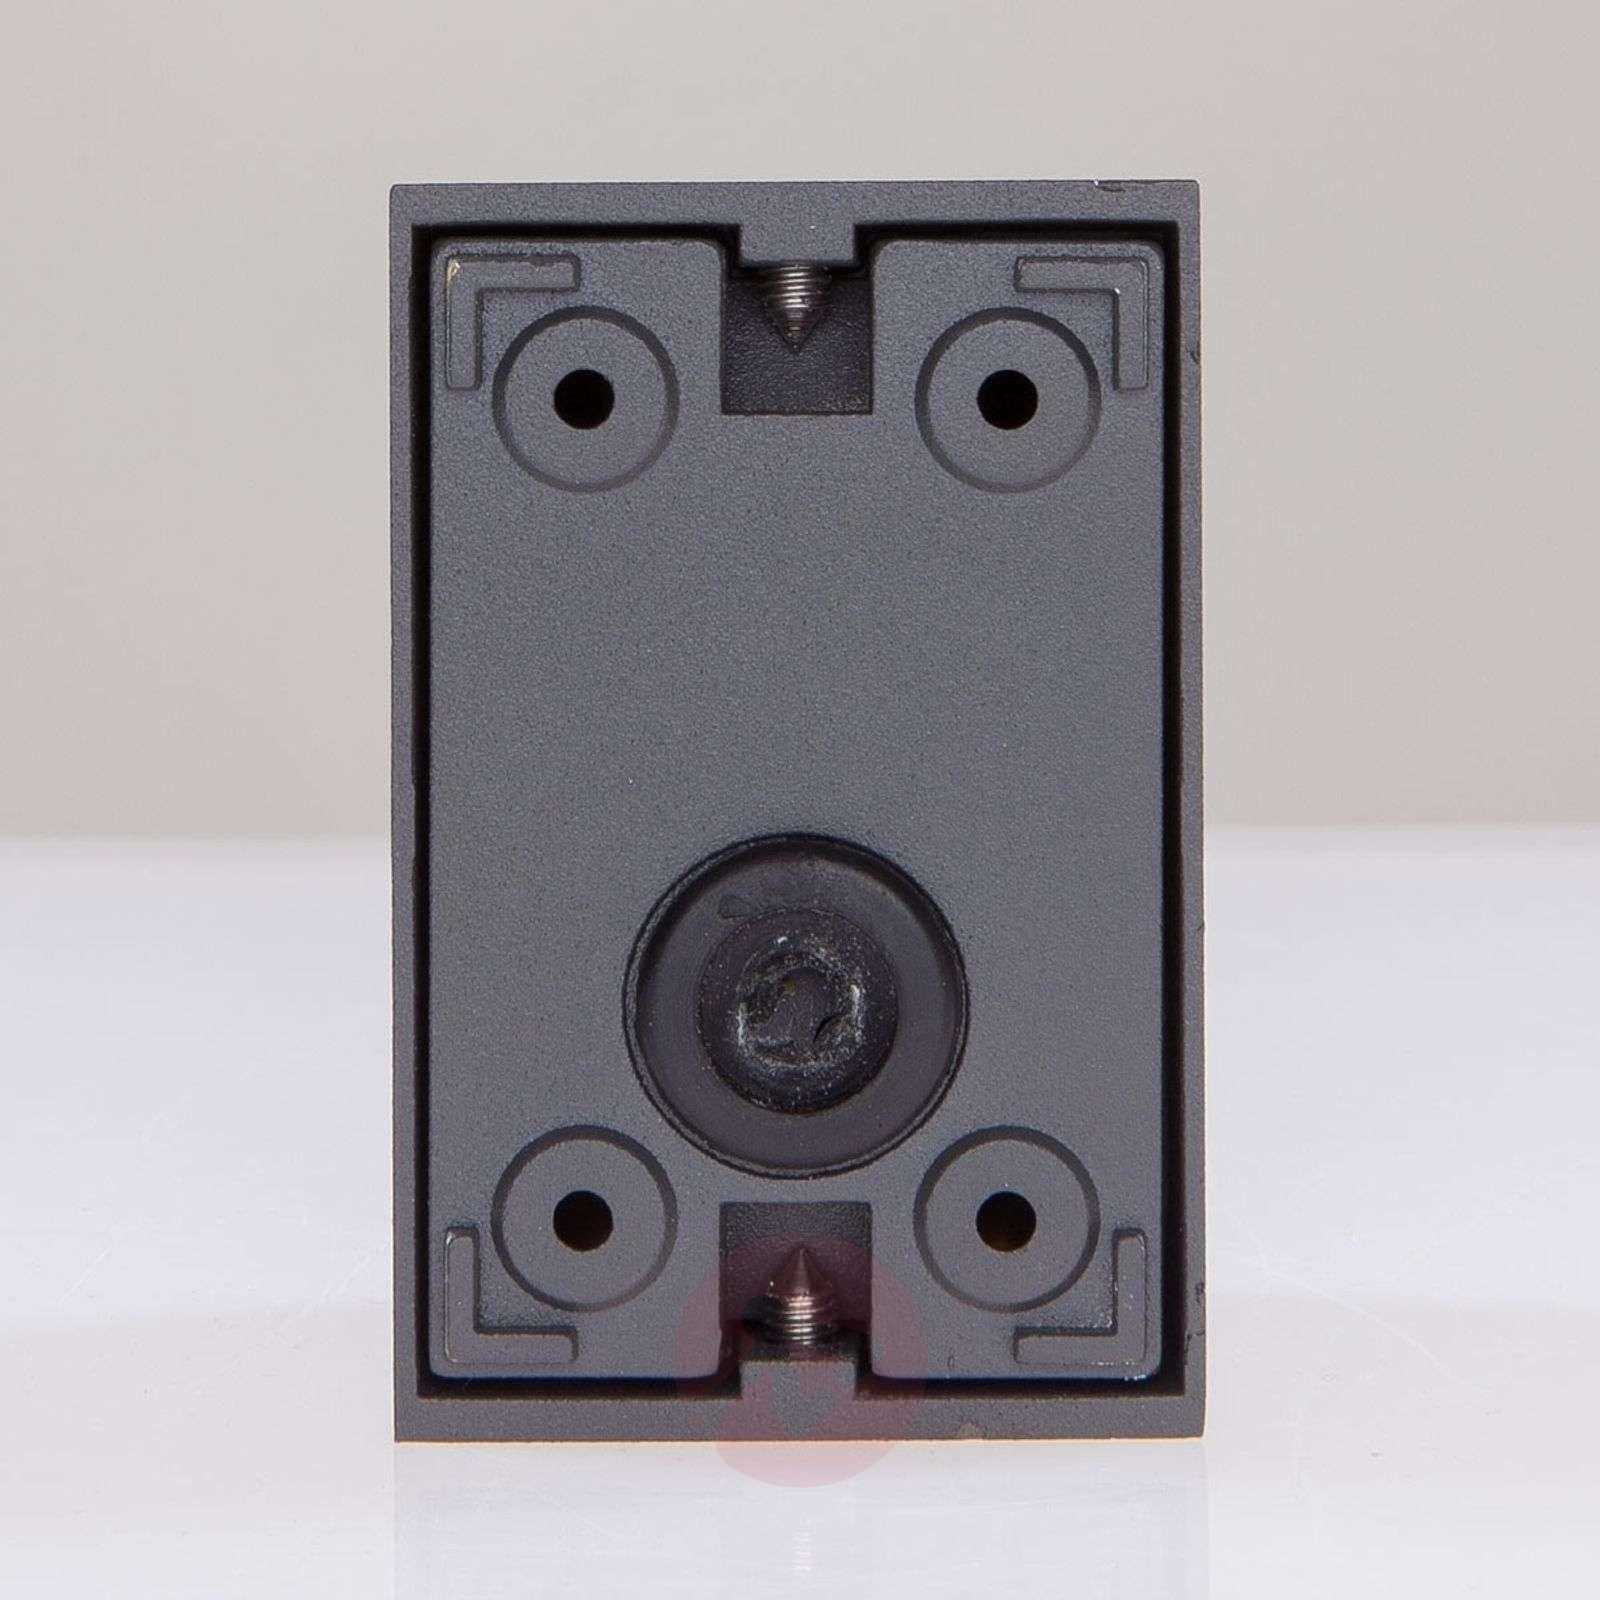 Graphite grey LED outdoor wall light Tavi, 9.5 cm-9616014-01